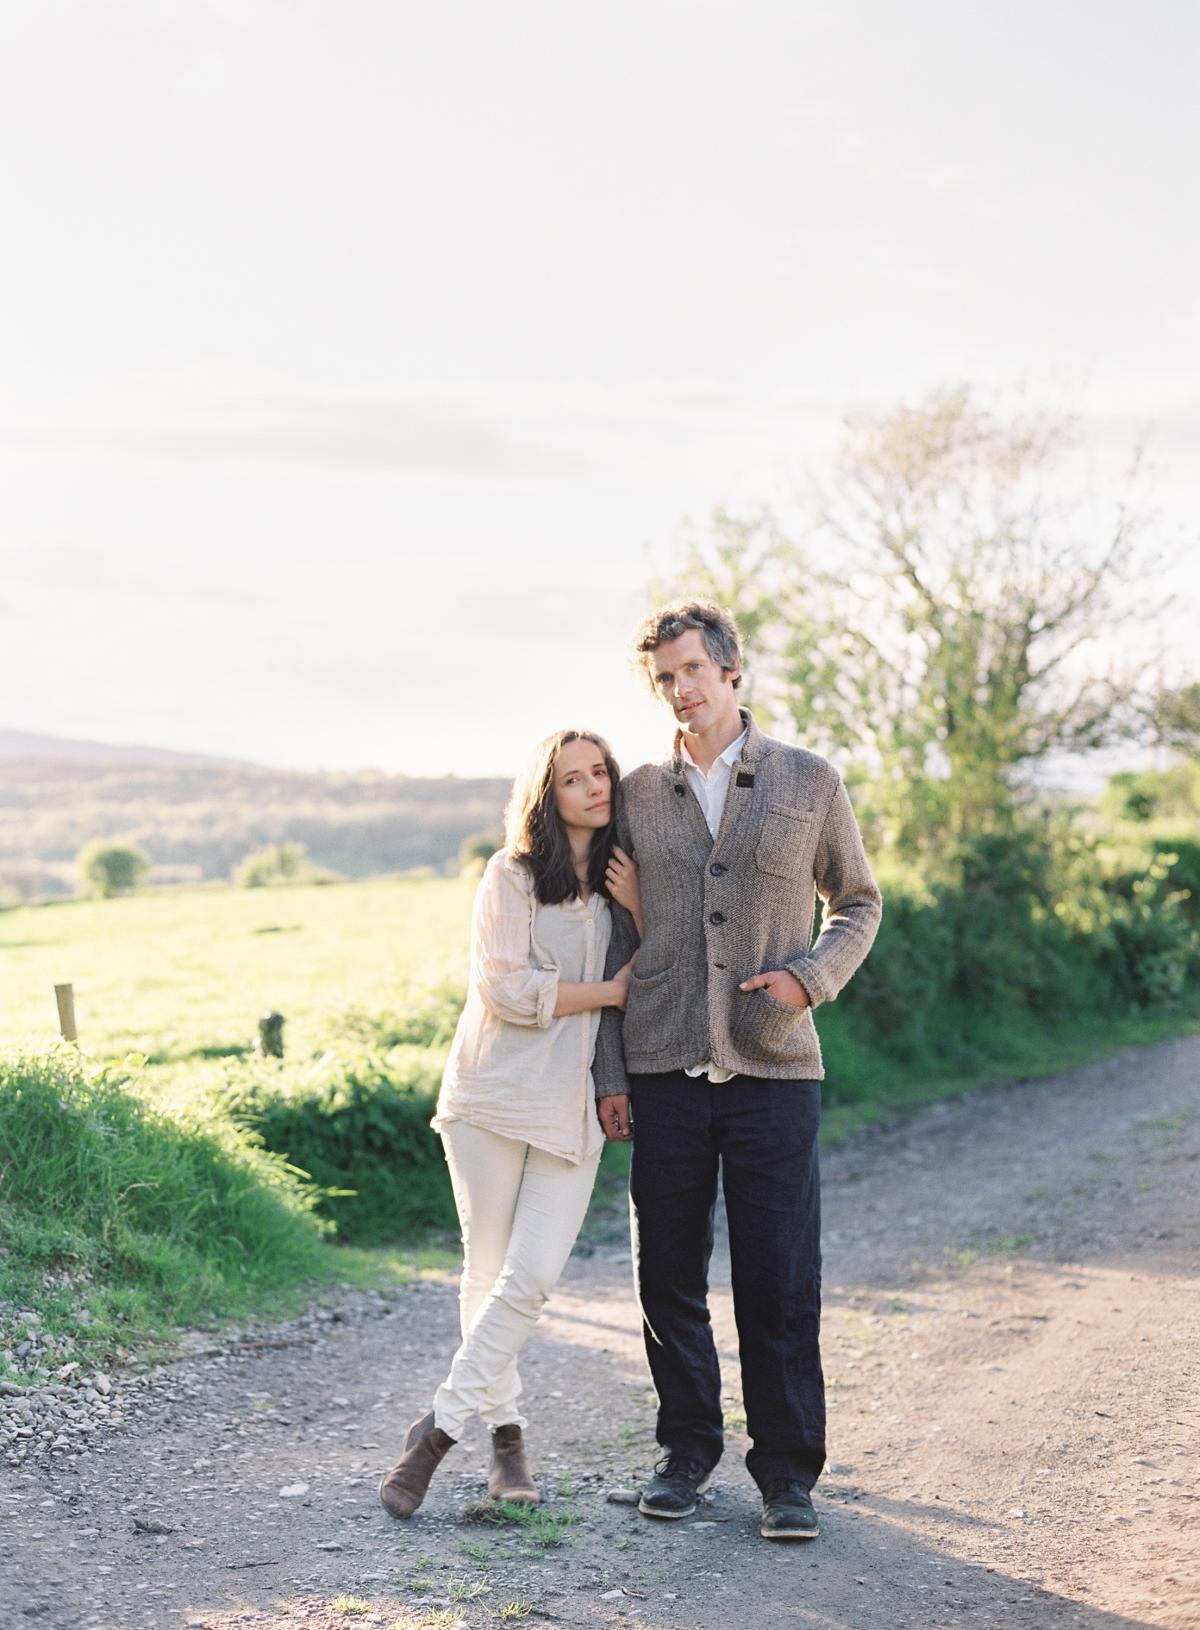 Pearl collins godiva cork ireland family photos 0026